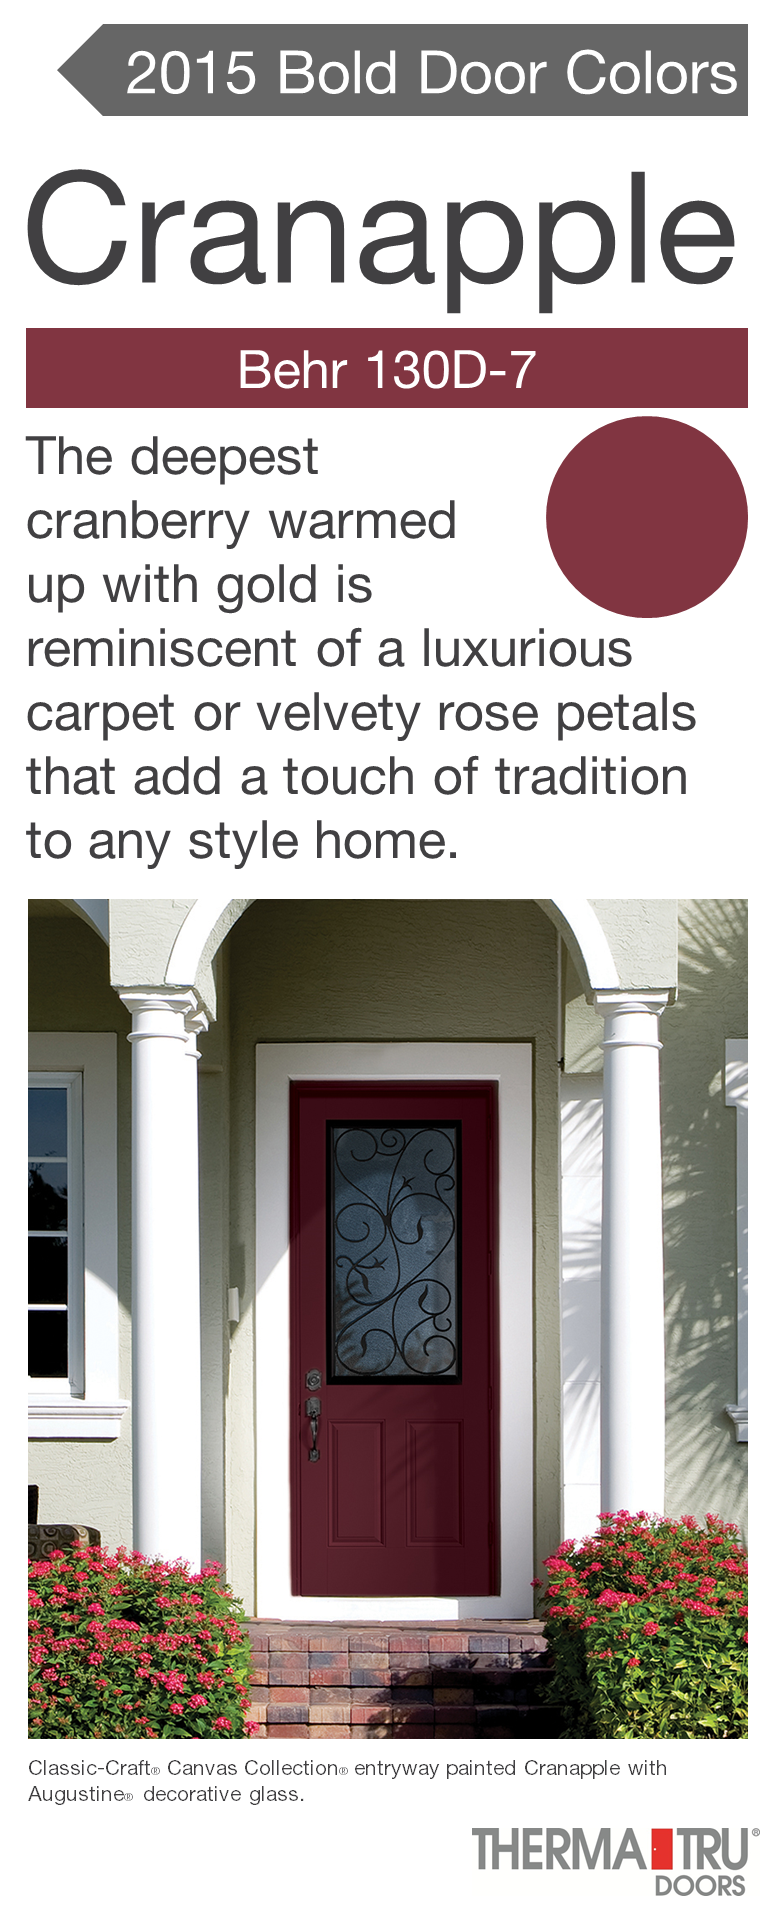 Classic craft canvas collection fiberglass door painted - Painting fiberglass exterior doors ...